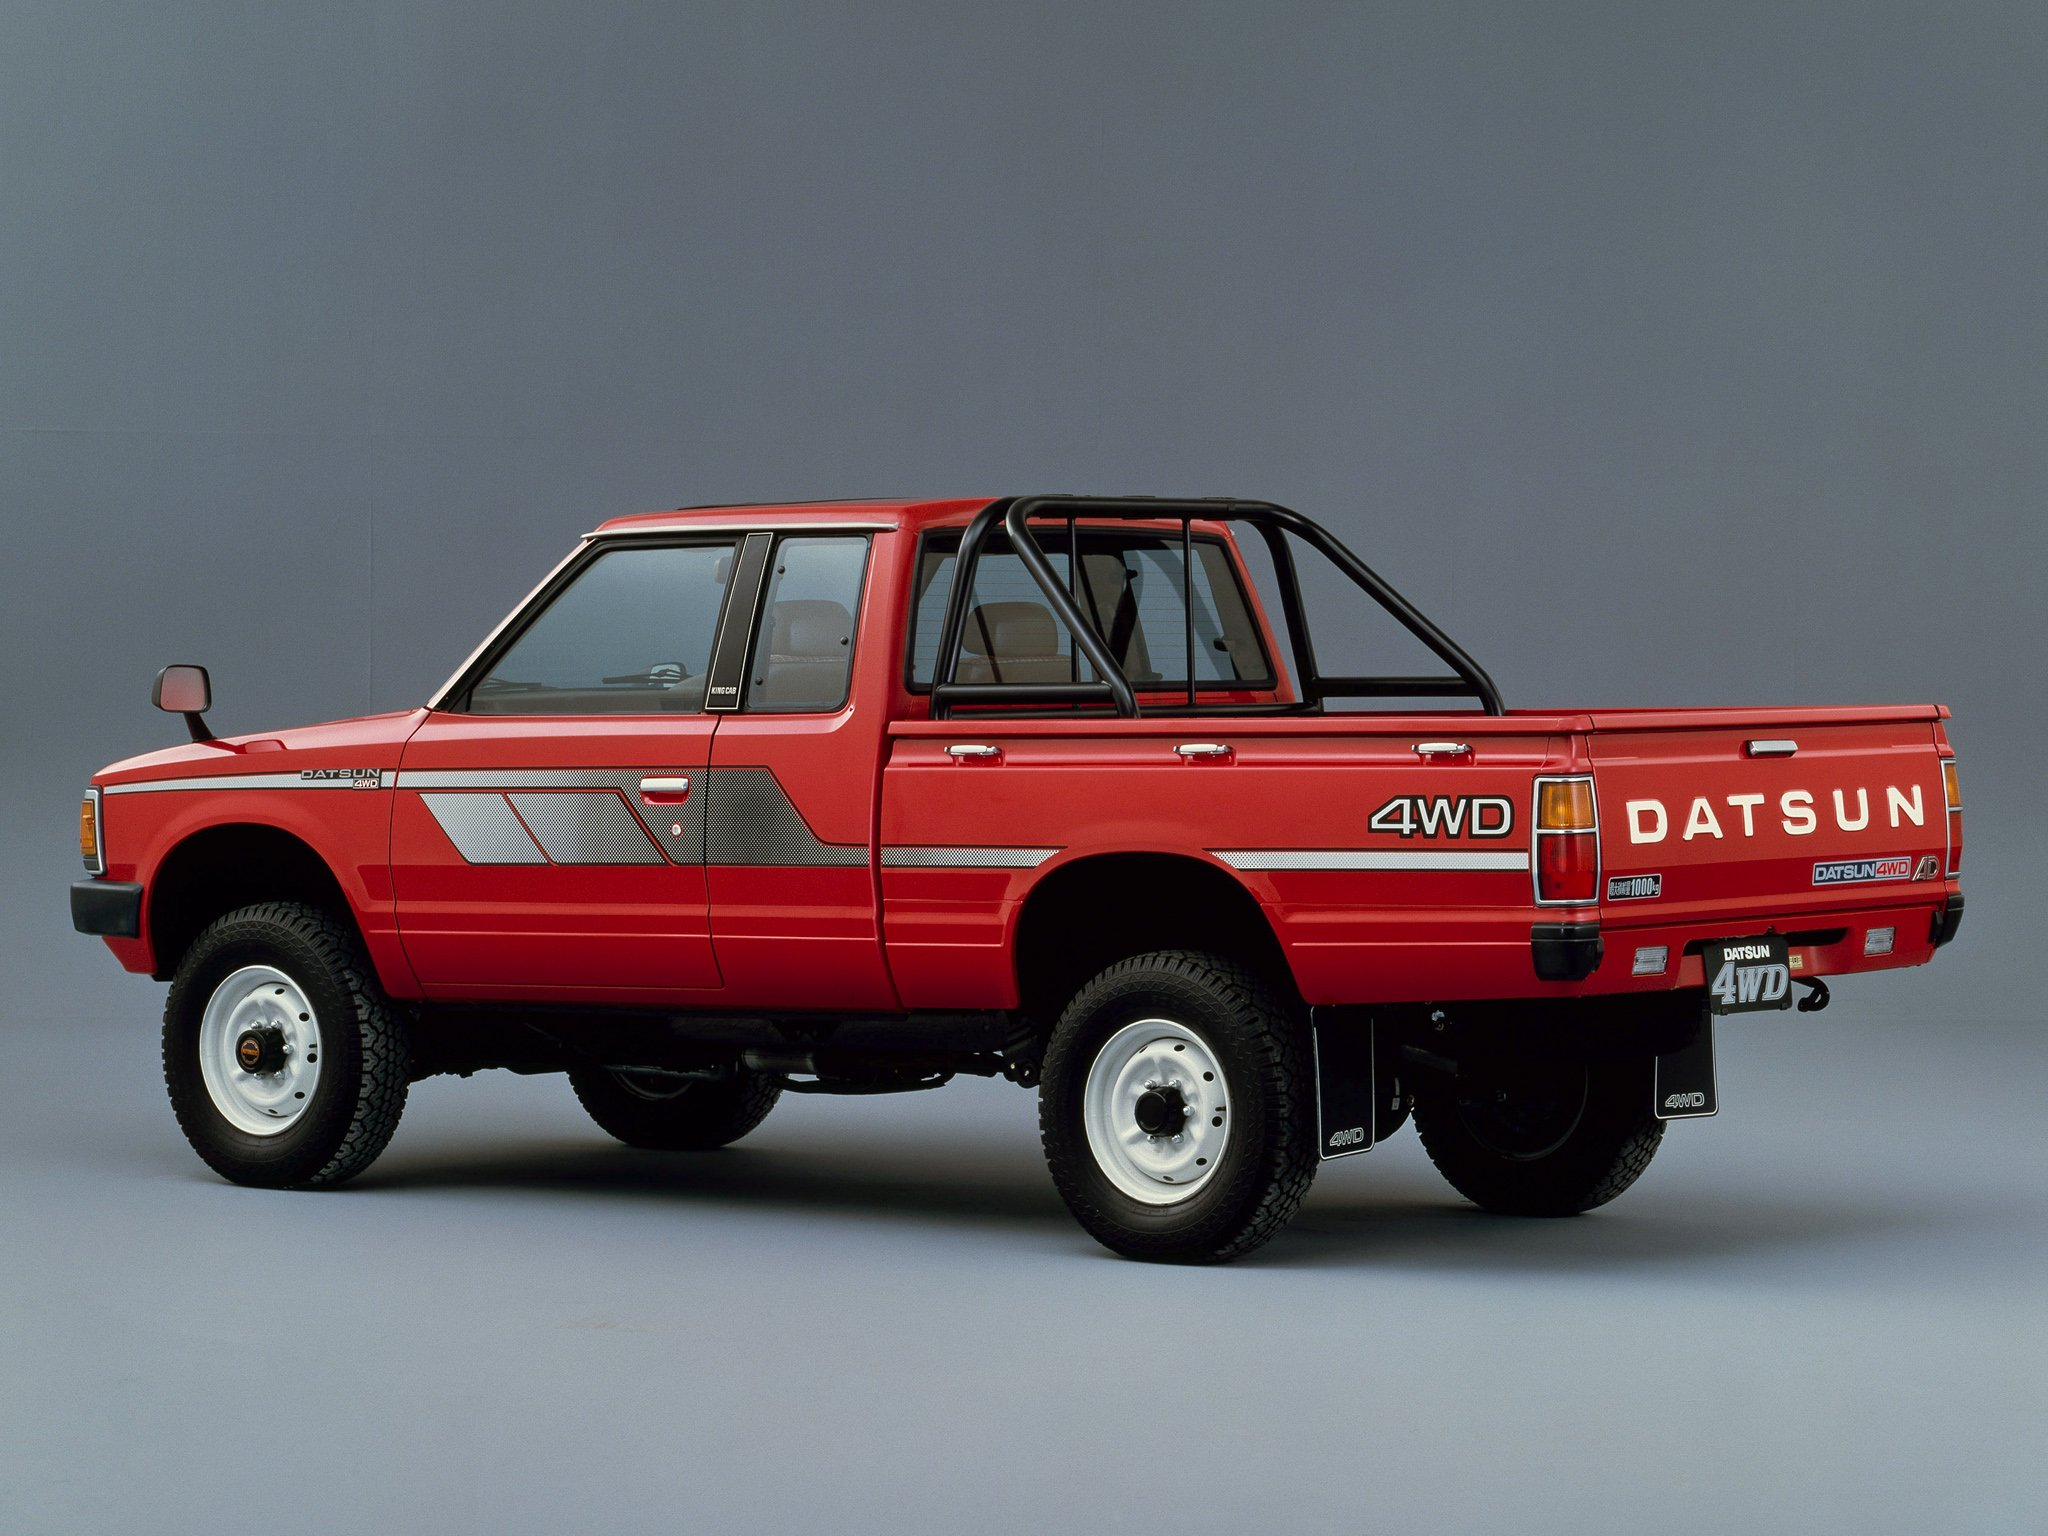 1982 Datsun Pickup 4wd King Cab Jp Spec 720 Nissan Gg